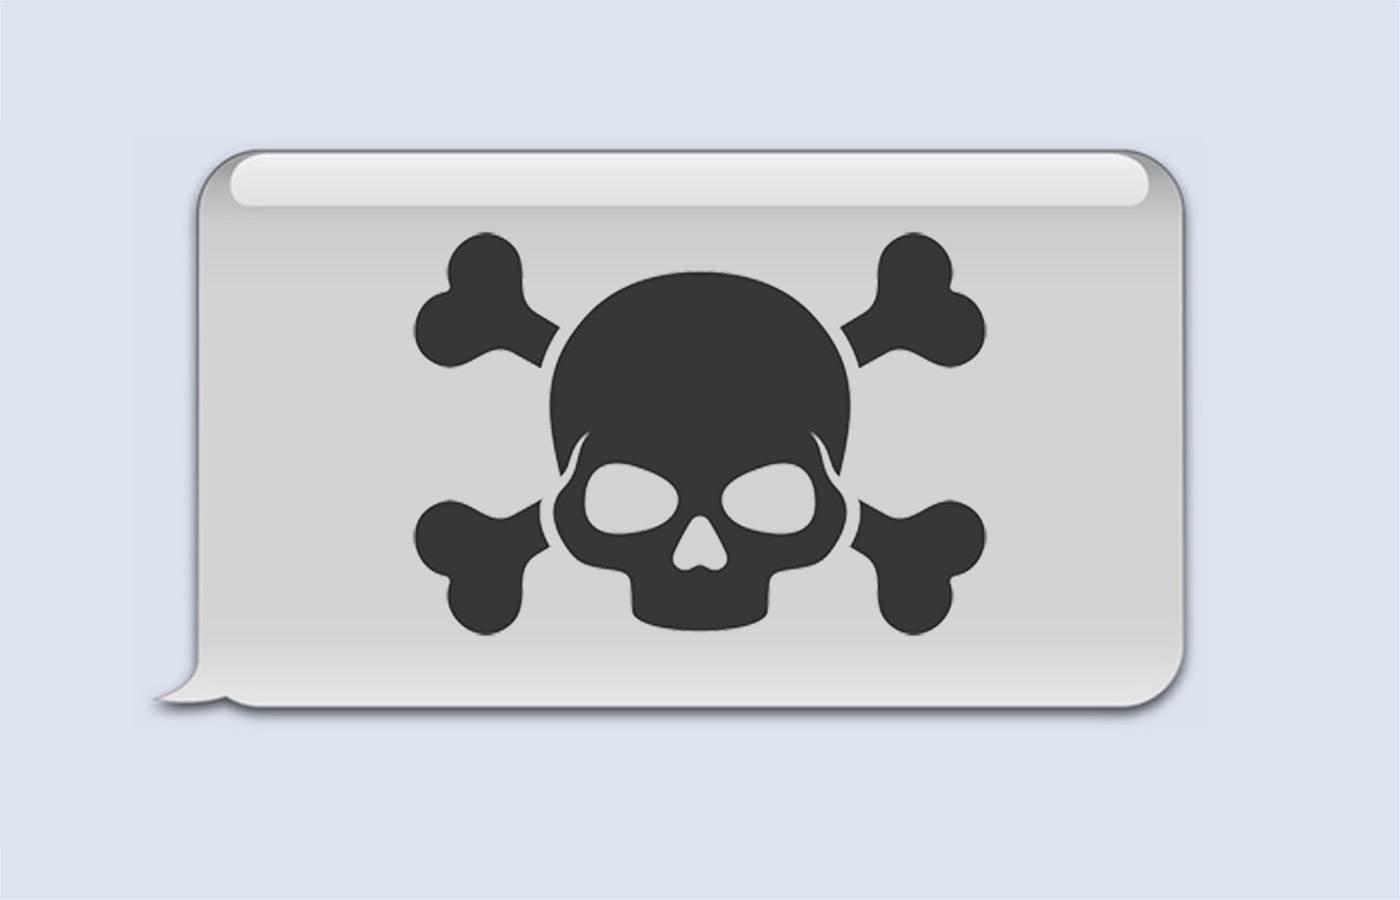 Apple rushing to fix Telugu script bug causing device crash